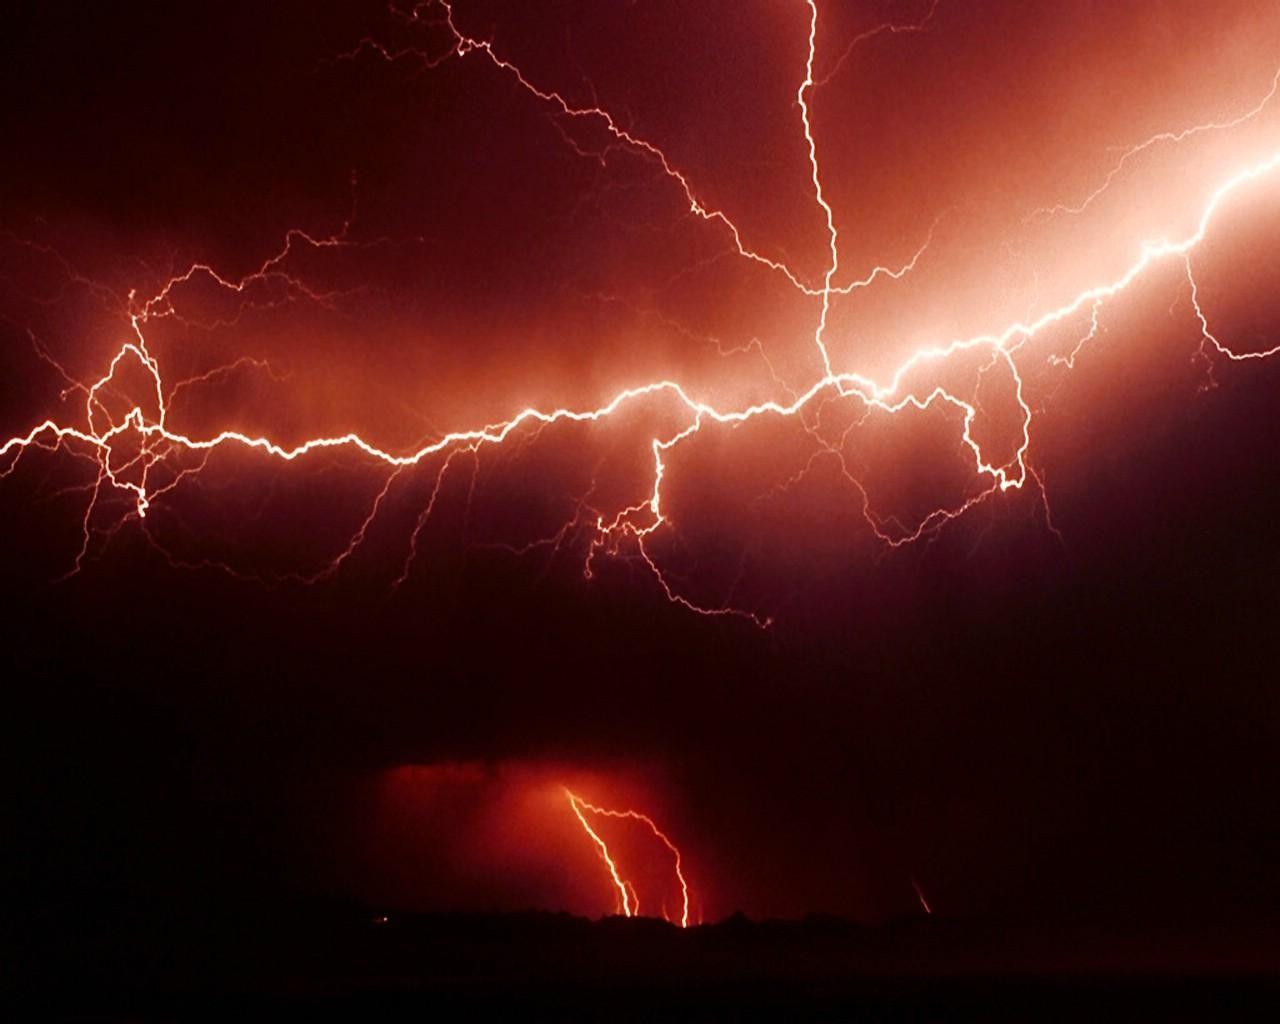 Get Volcano Lightning Storm Wallpaper images [1280x1024] for